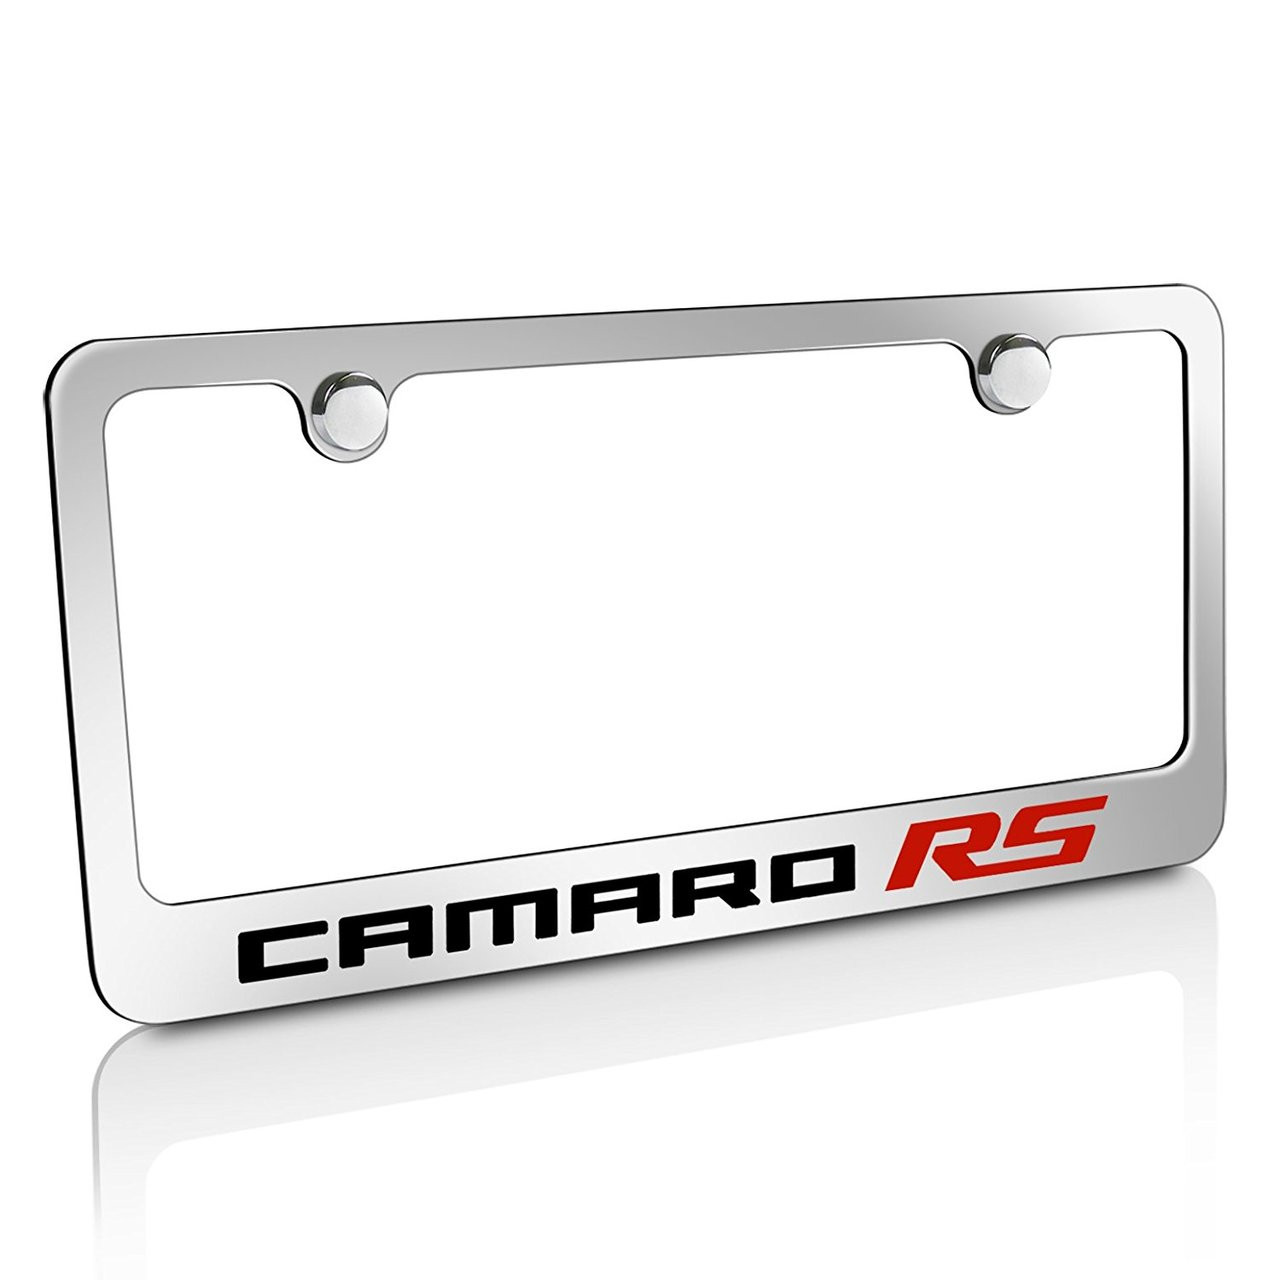 Chevy Camaro RS 2010 Chrome Brass License Plate Frame - Car Beyond Store